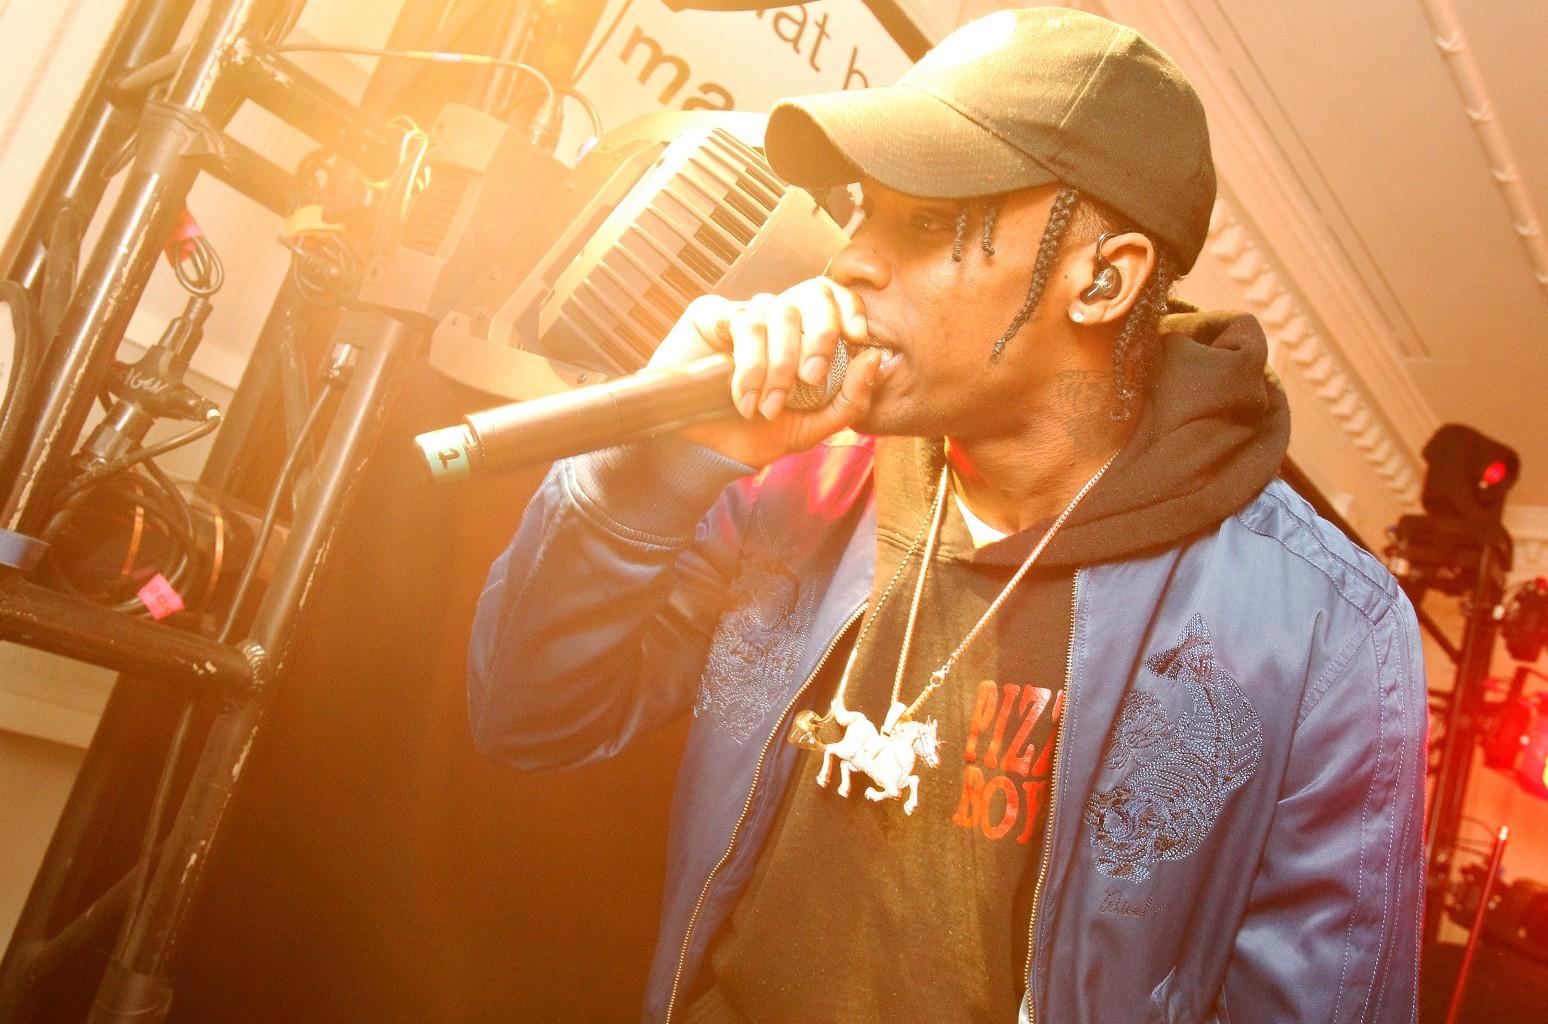 Travis Scott performs on Feb. 13, 2016 in New York City.